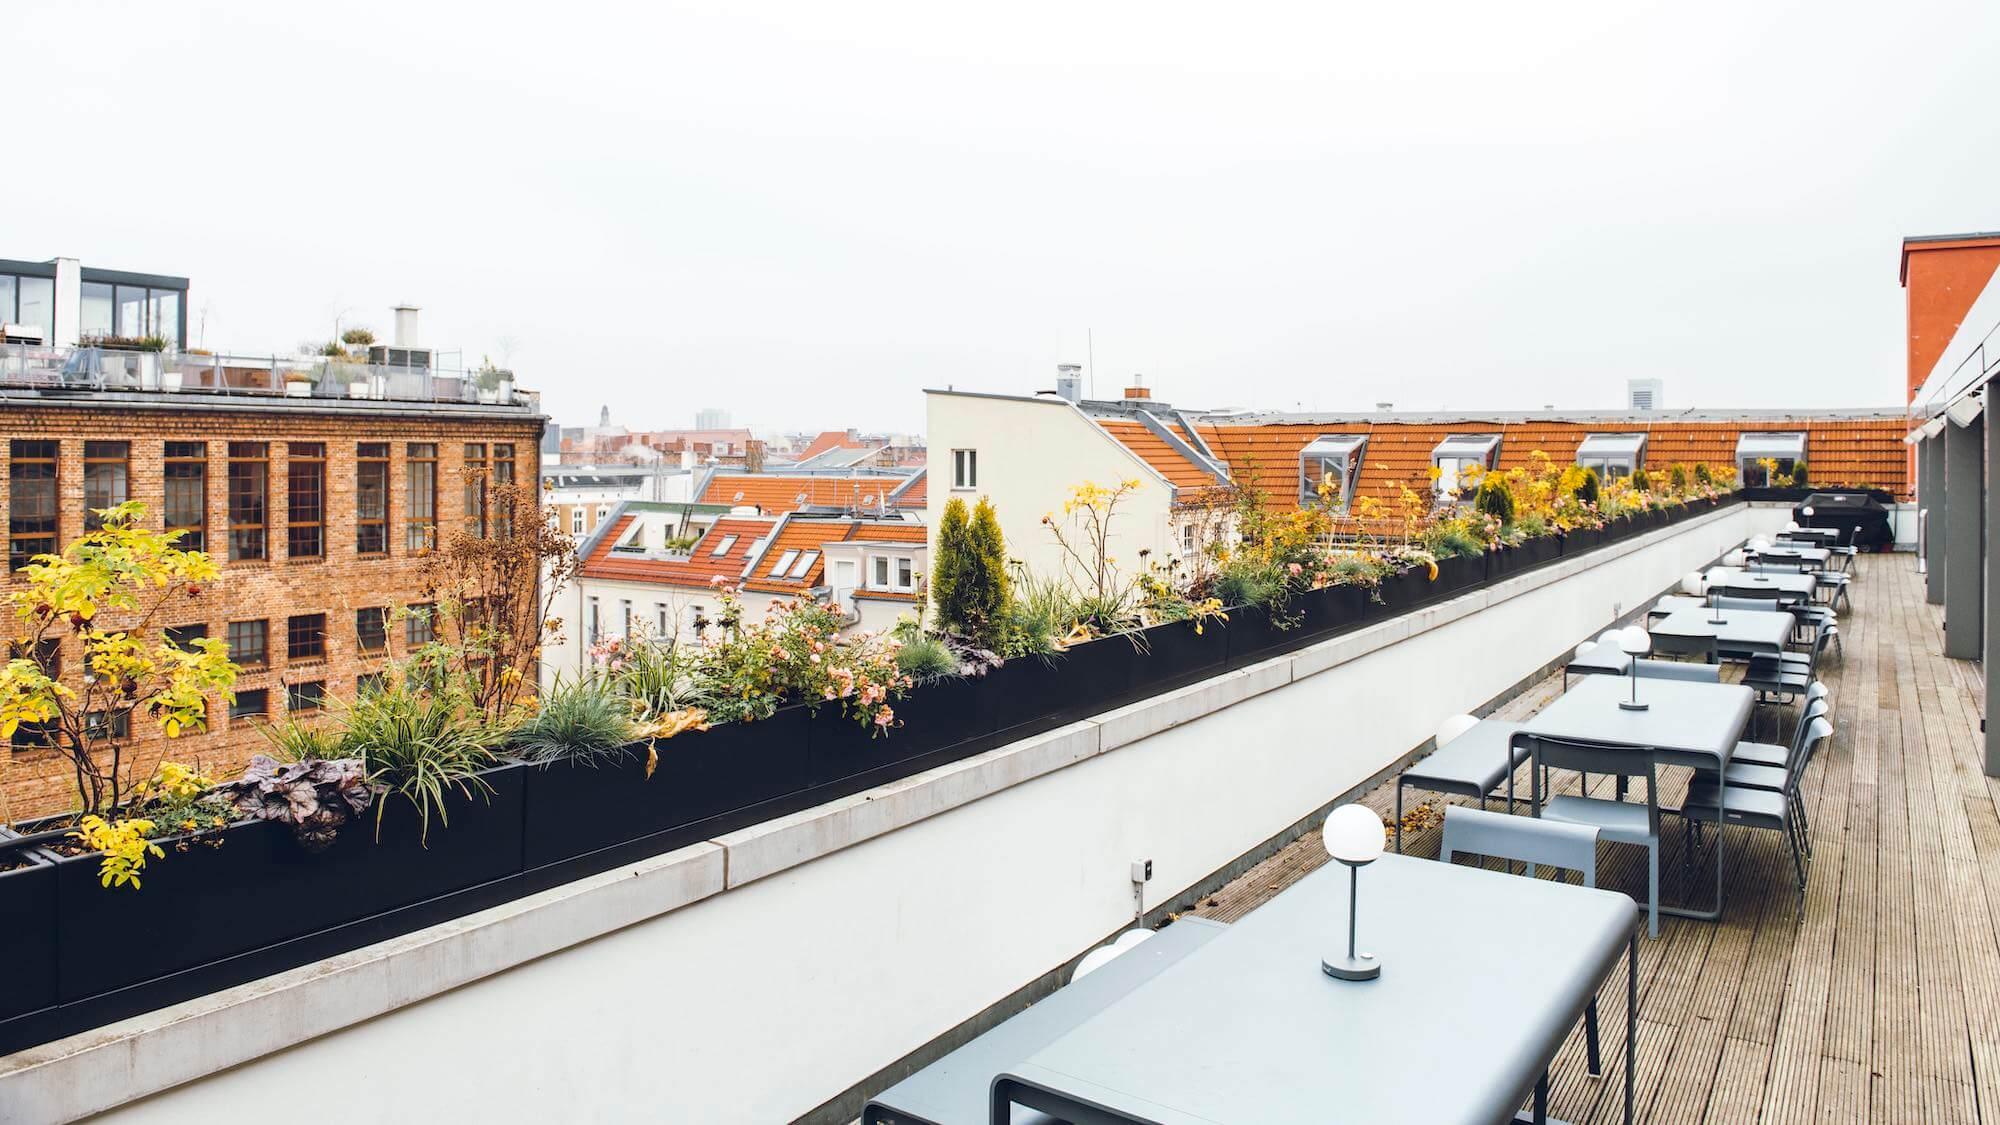 Onefootball Startup Büro TKEZ Architekten Dachterrasse New Work